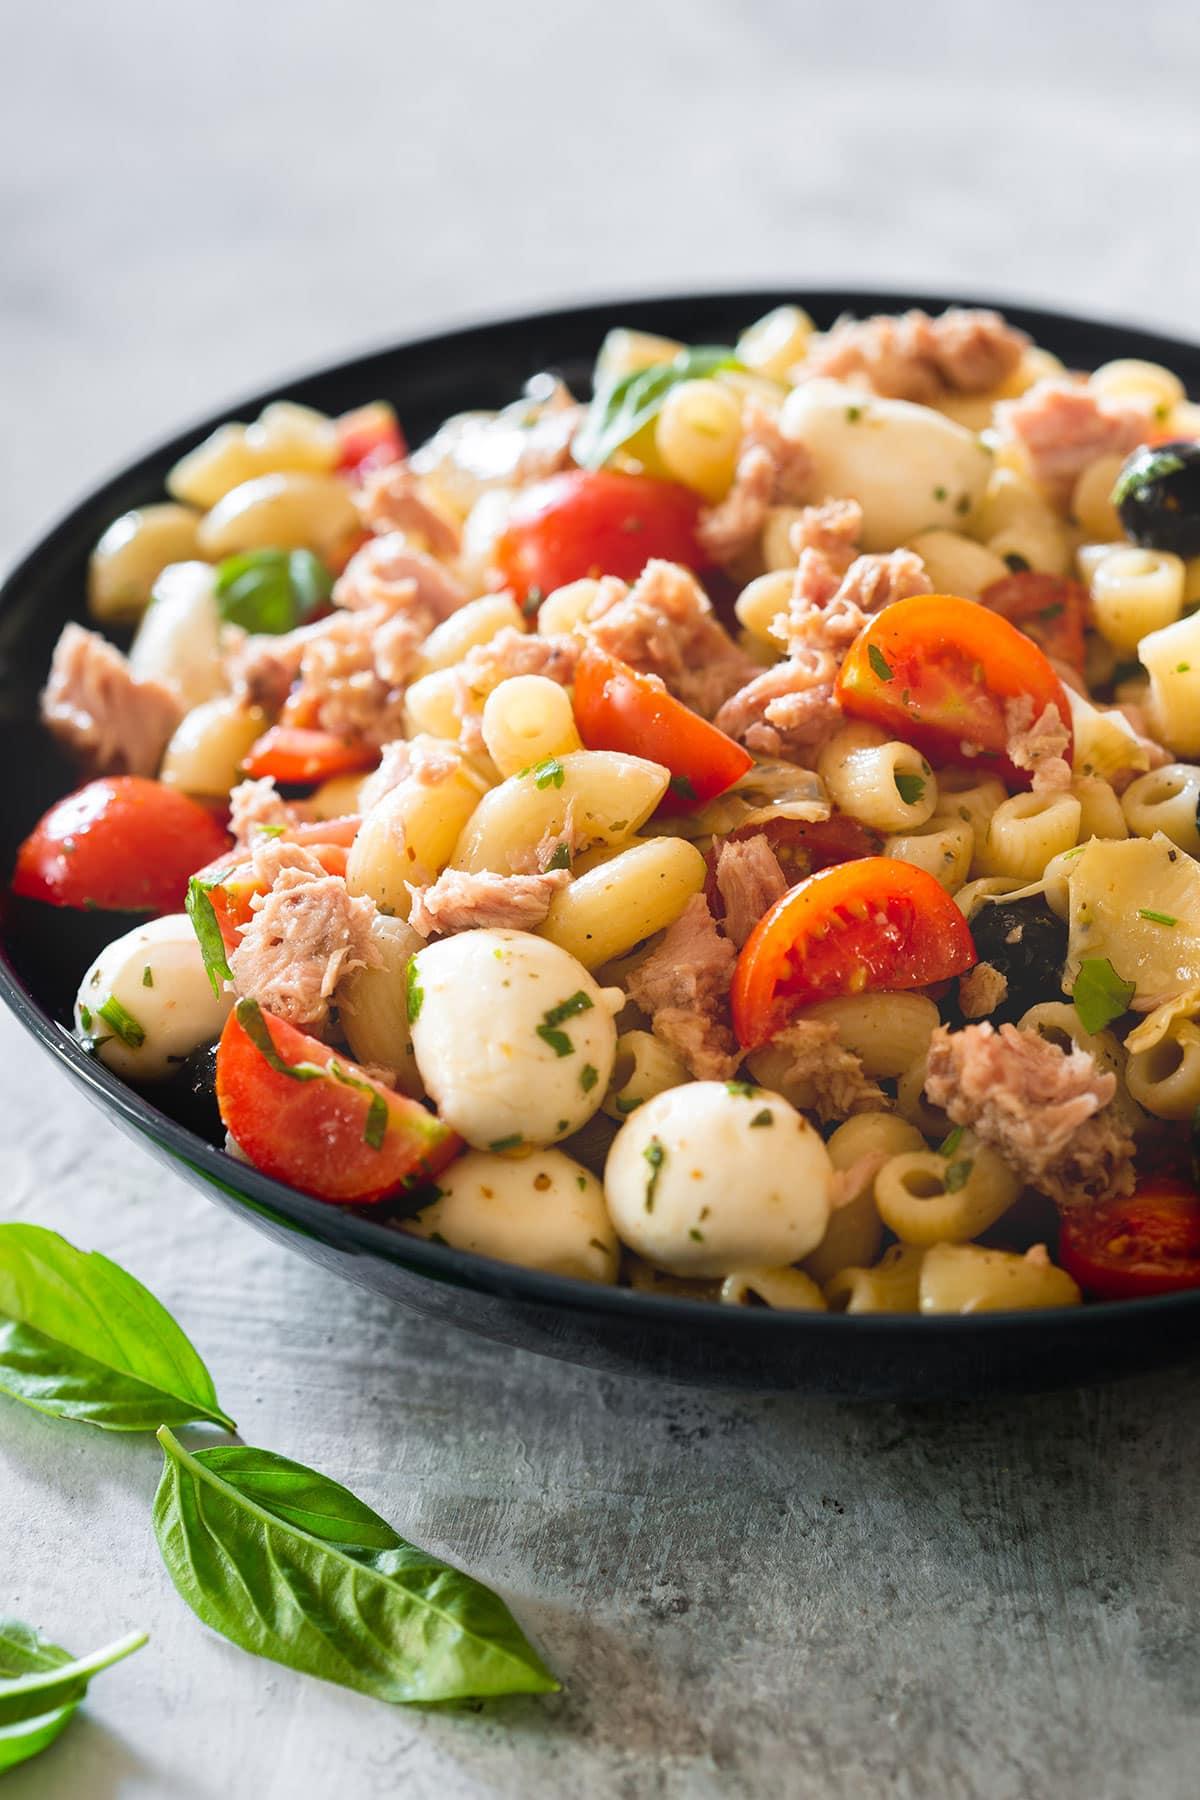 Italian tuna pasta salad on a bowl.